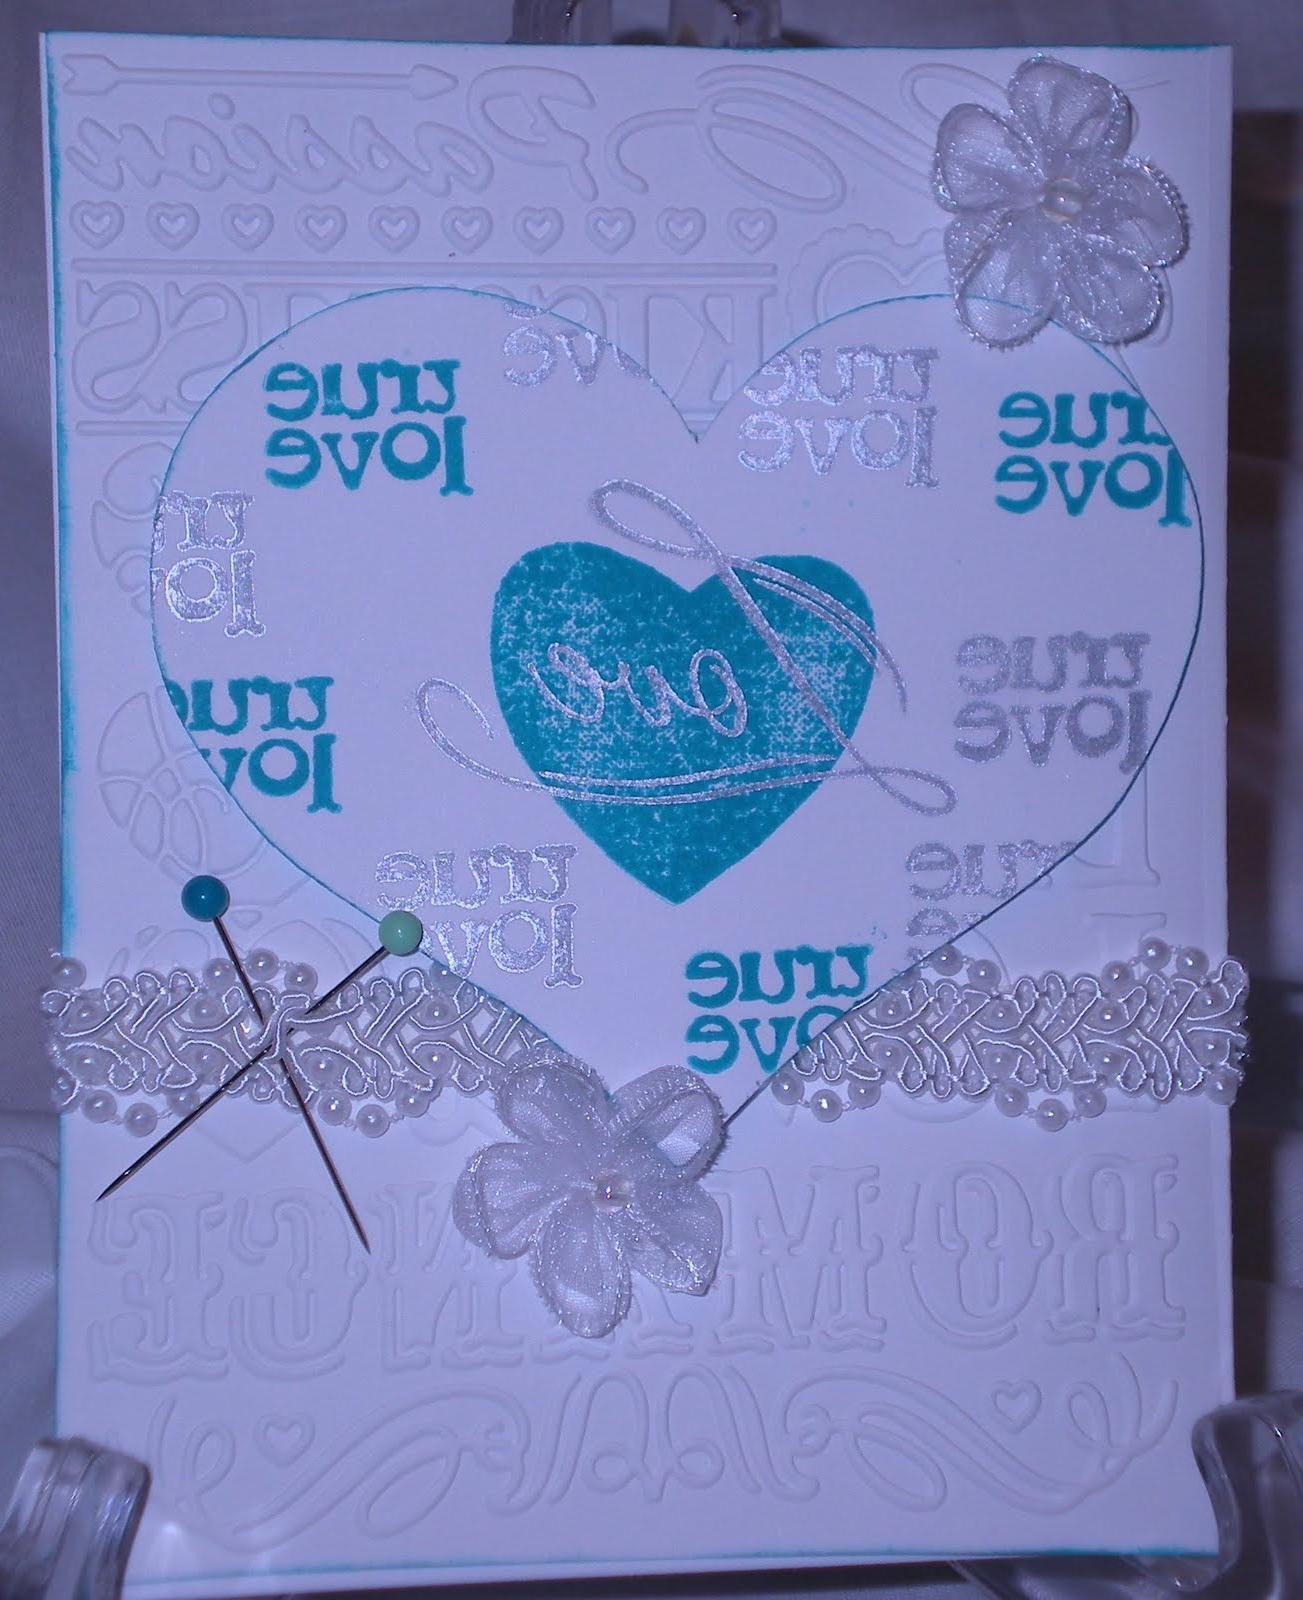 blue as their wedding